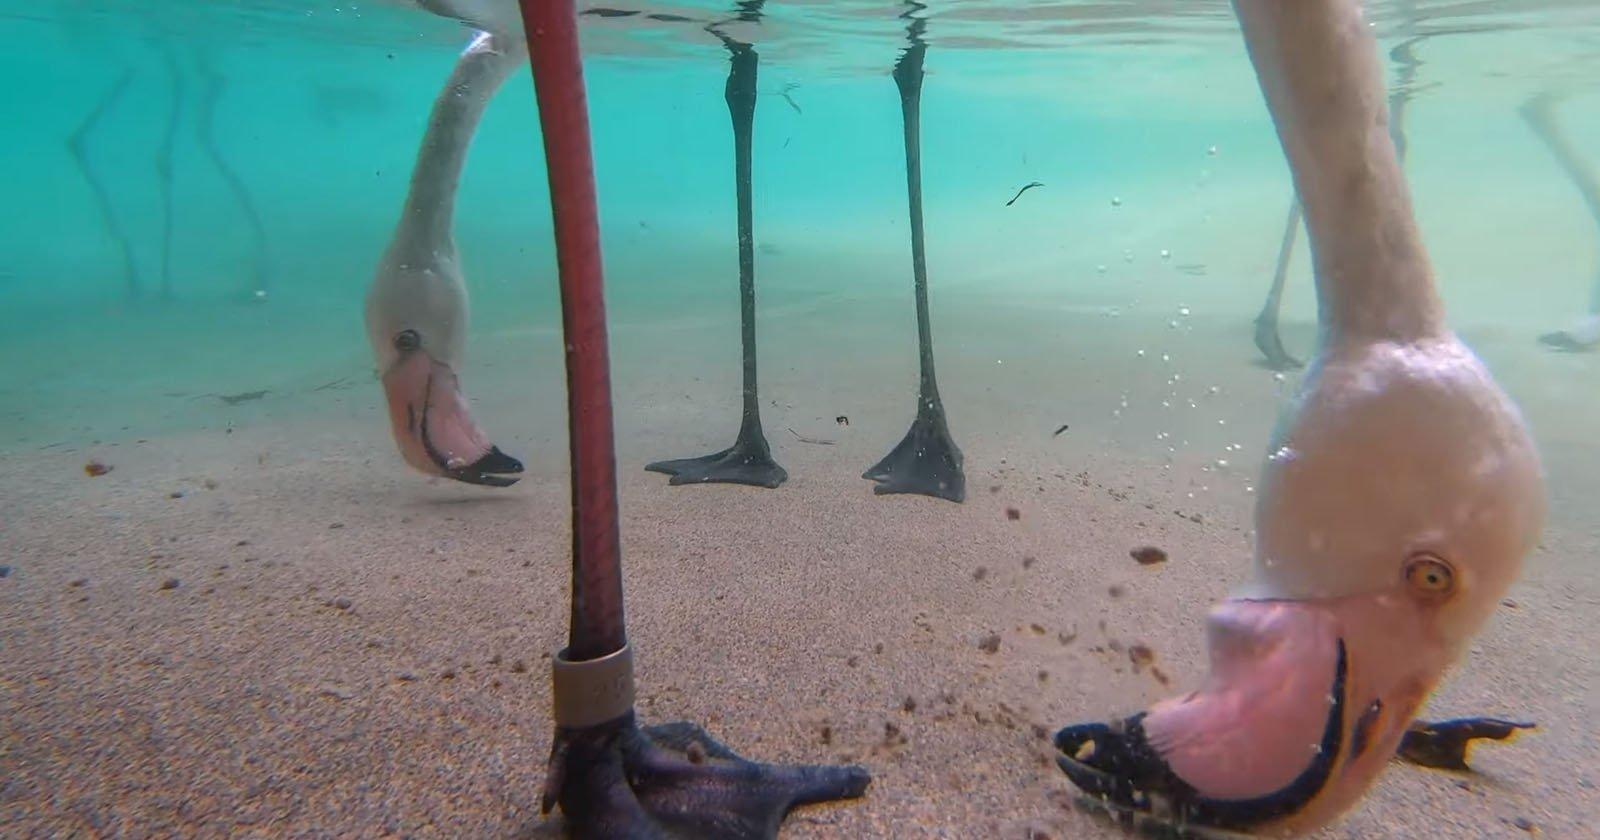 Underwater Camera Reveals the Weird Way Flamingos Eat